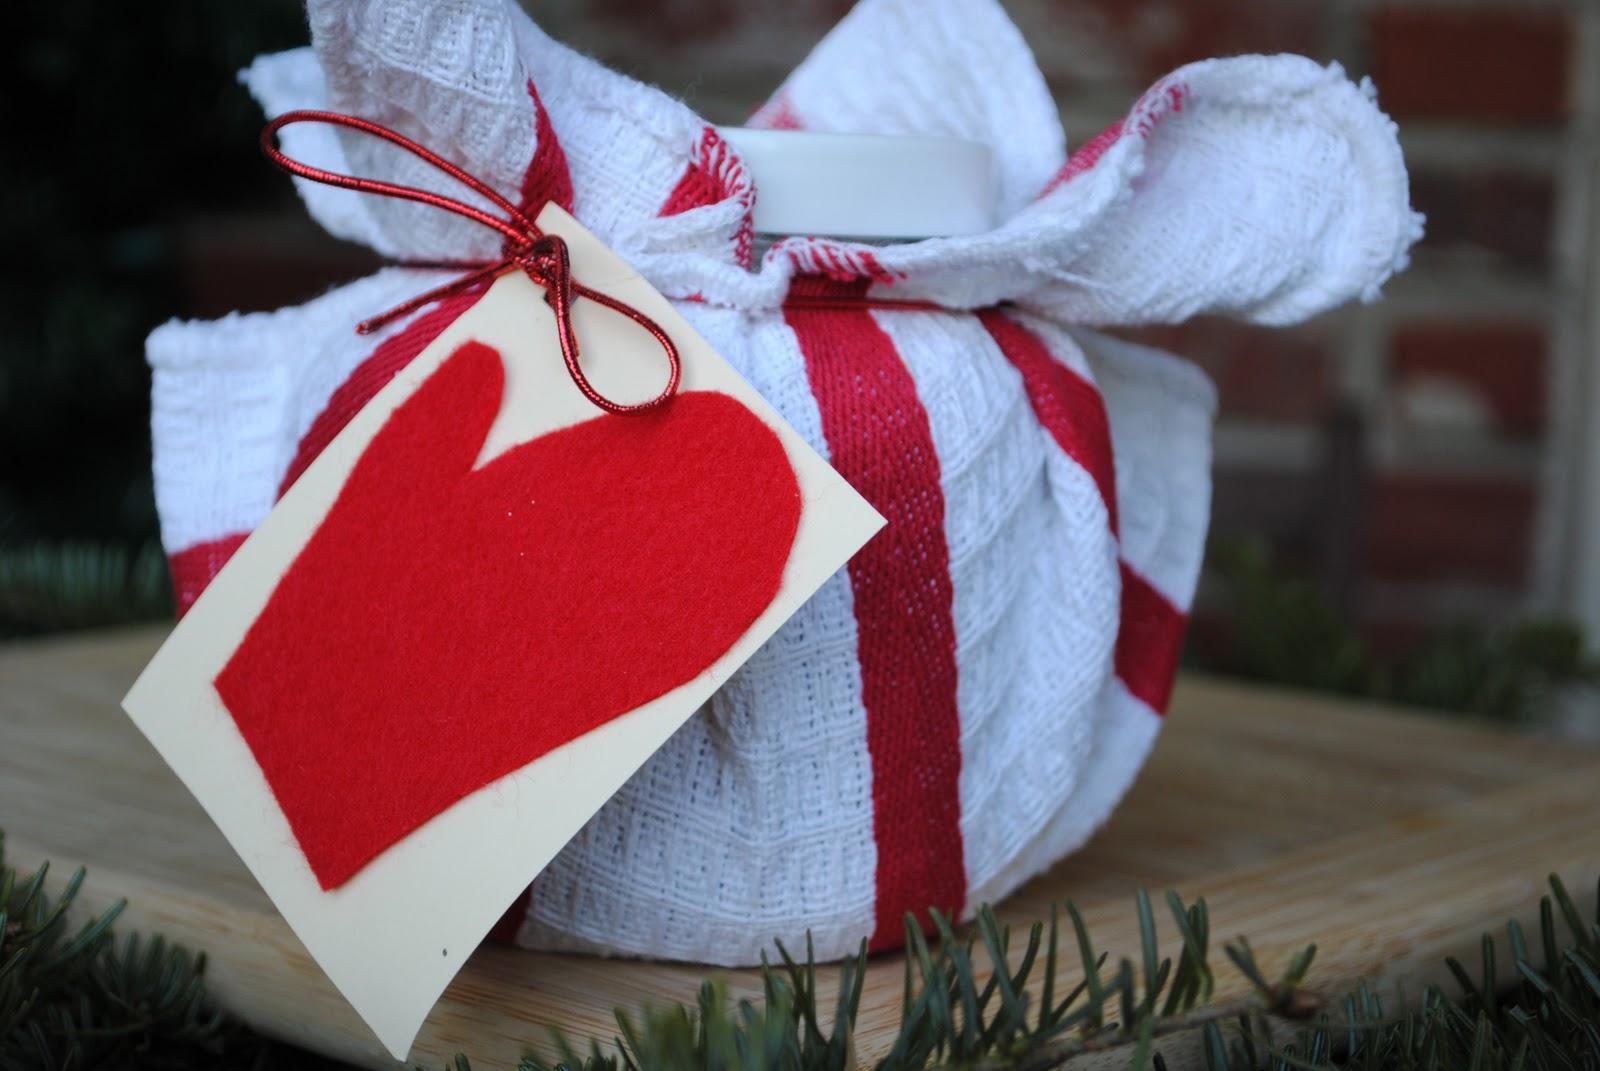 Homemade Christmas Gift: Hot Cocoa Kit